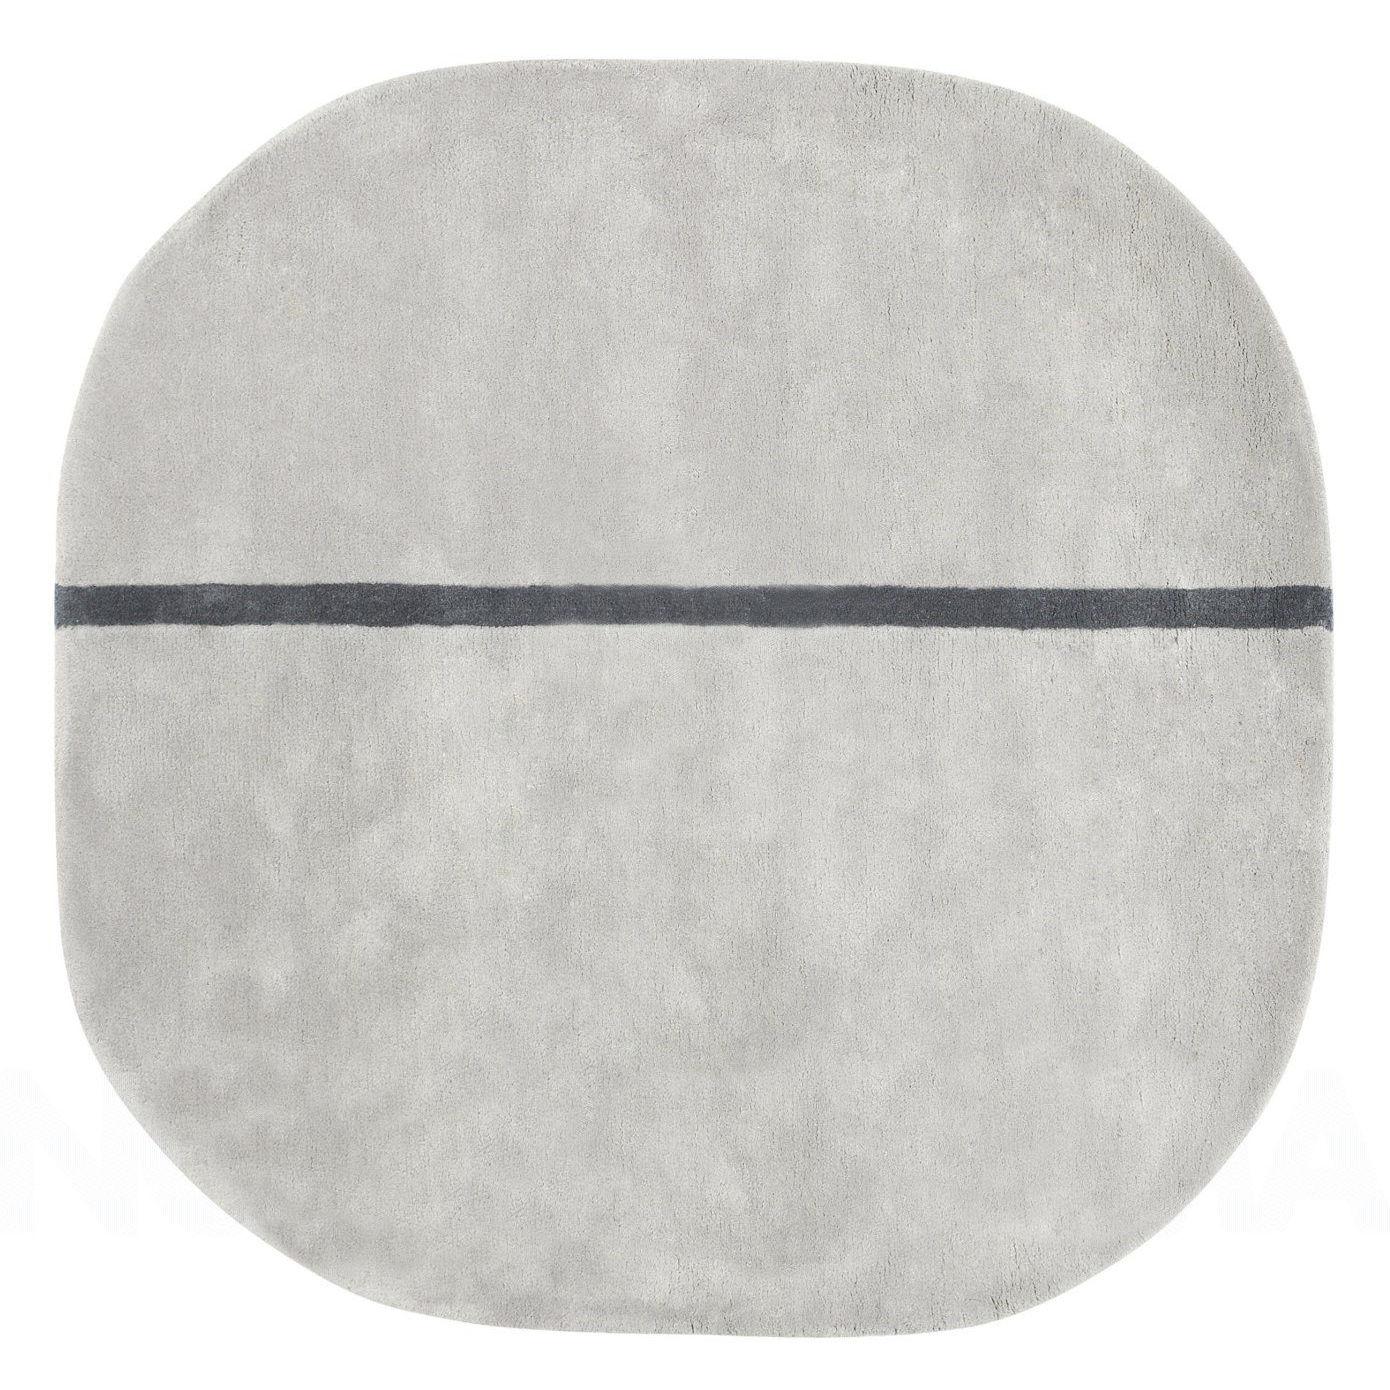 tapis oona 140 x 140 cm gris normann copenhagen. Black Bedroom Furniture Sets. Home Design Ideas